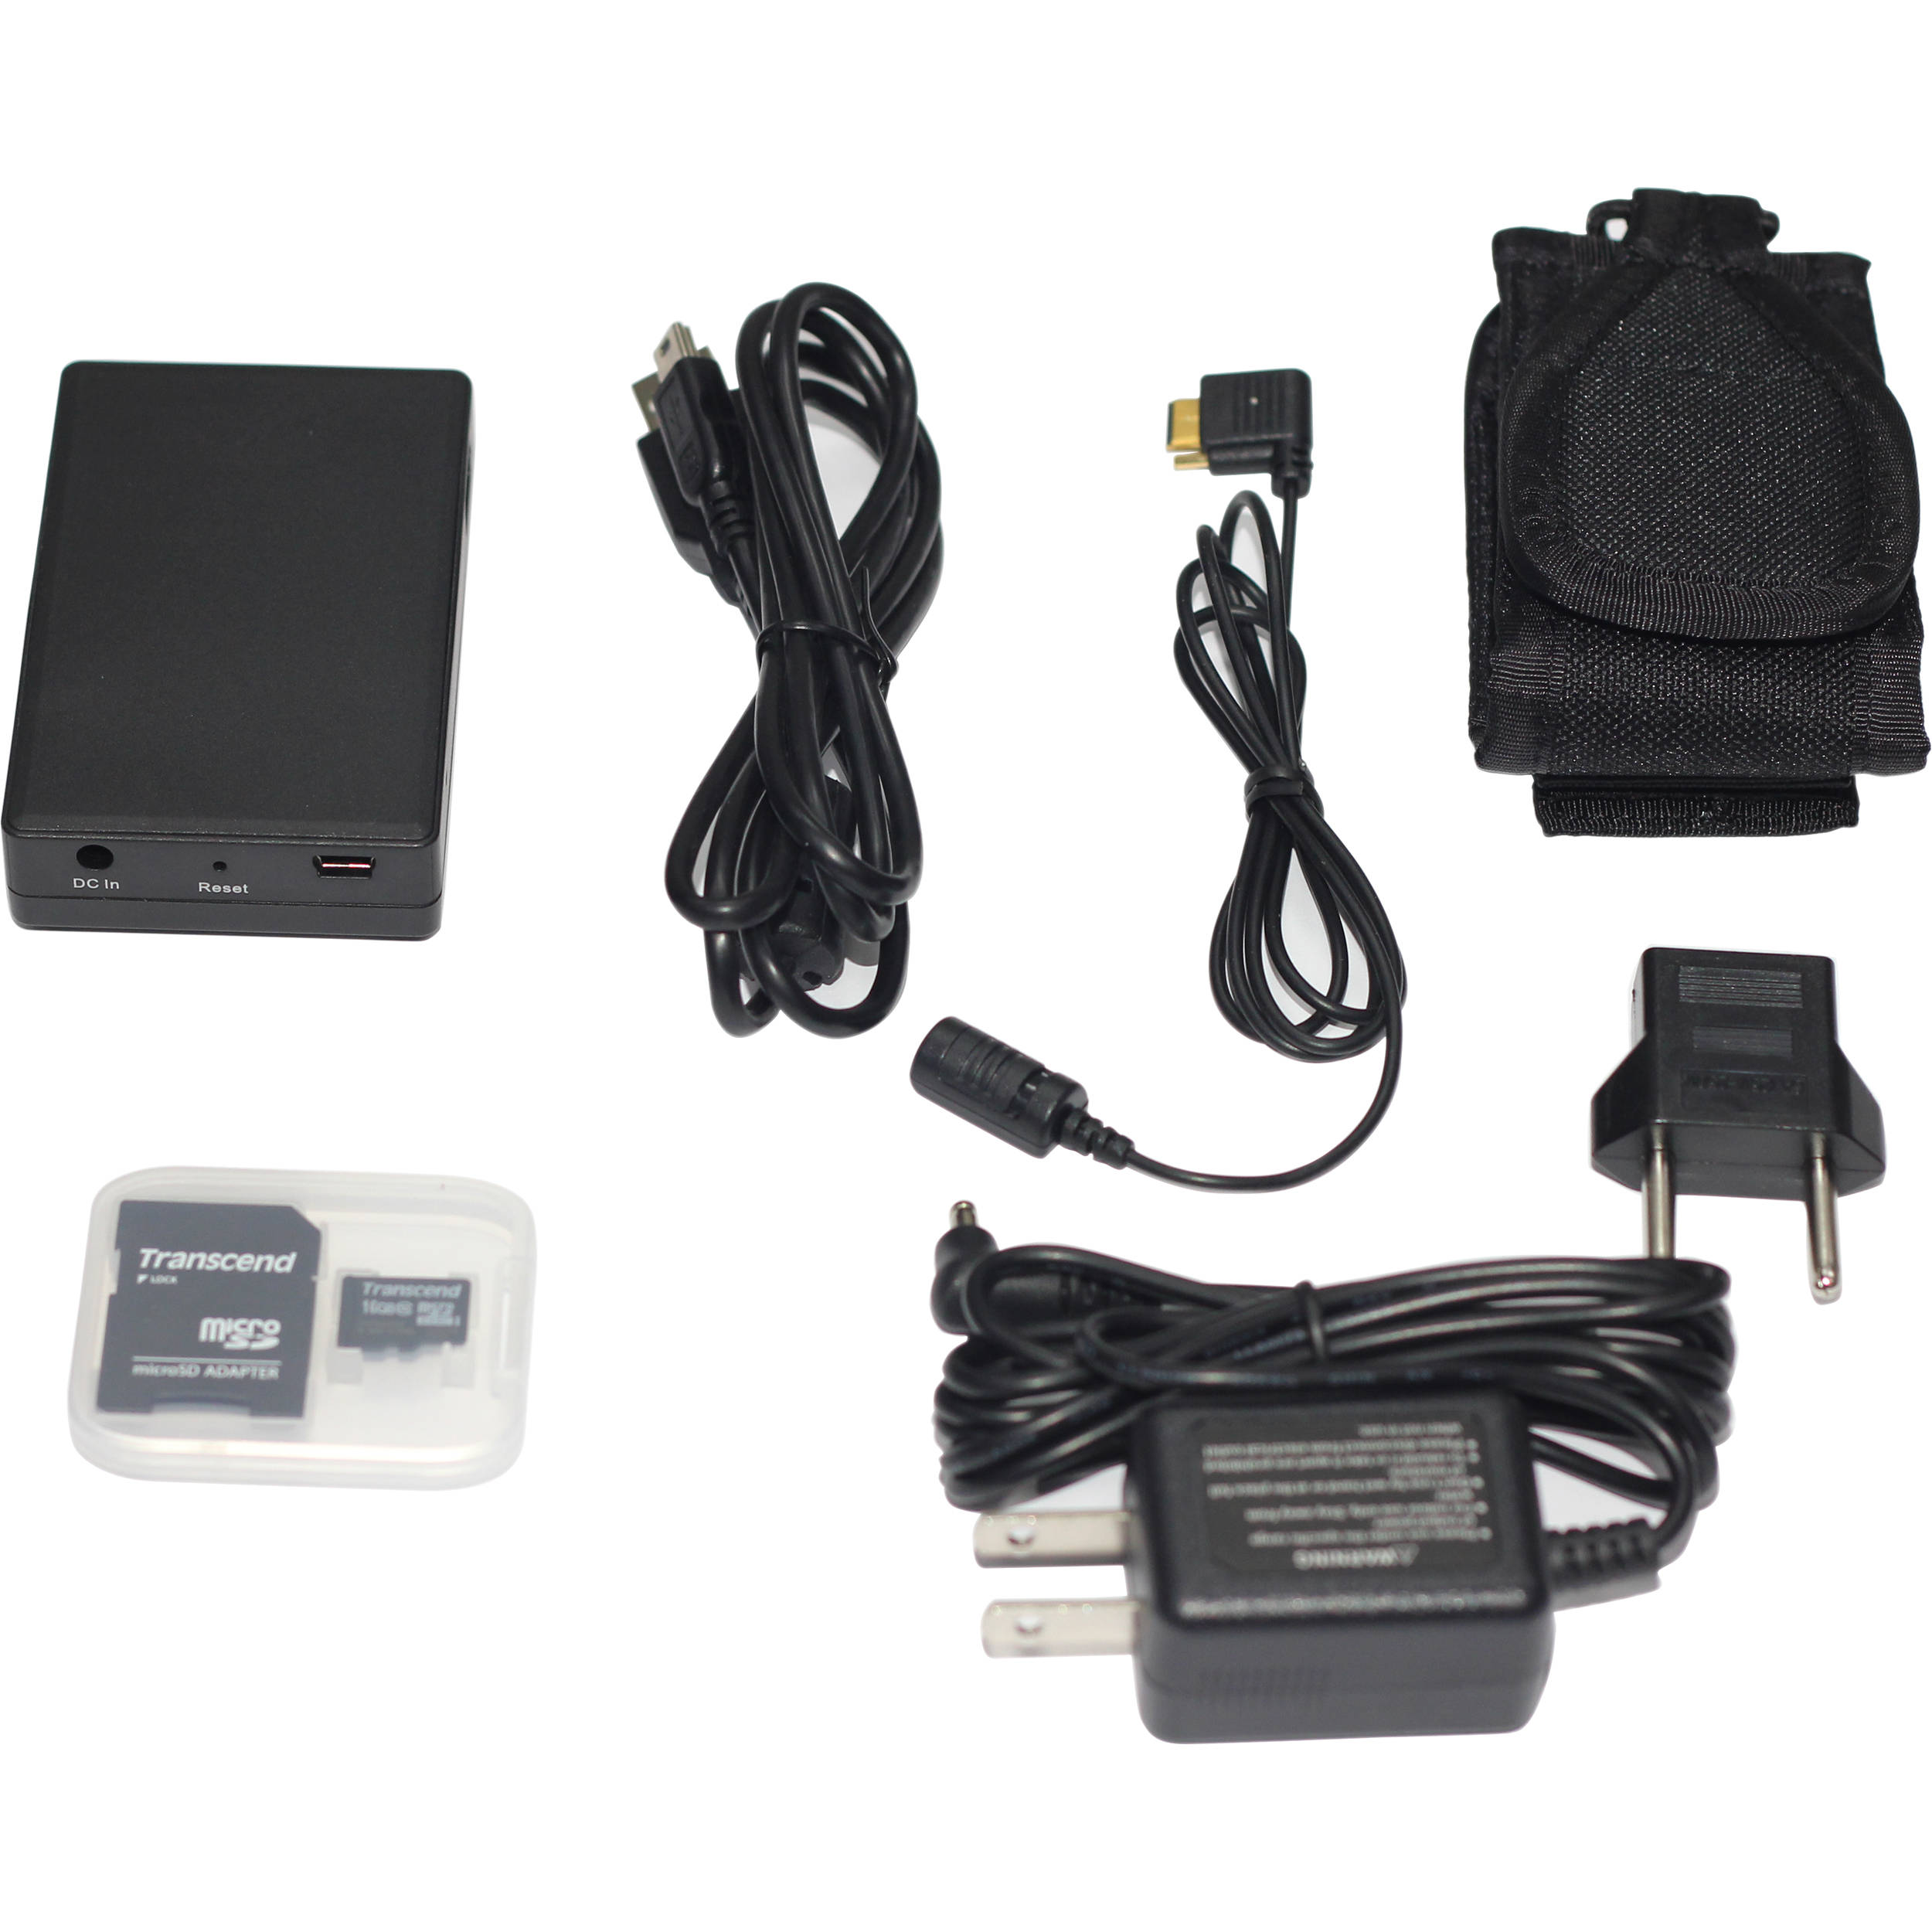 LawMate PV500W WiFi DVR and Full HD Digital Button Camera Kit